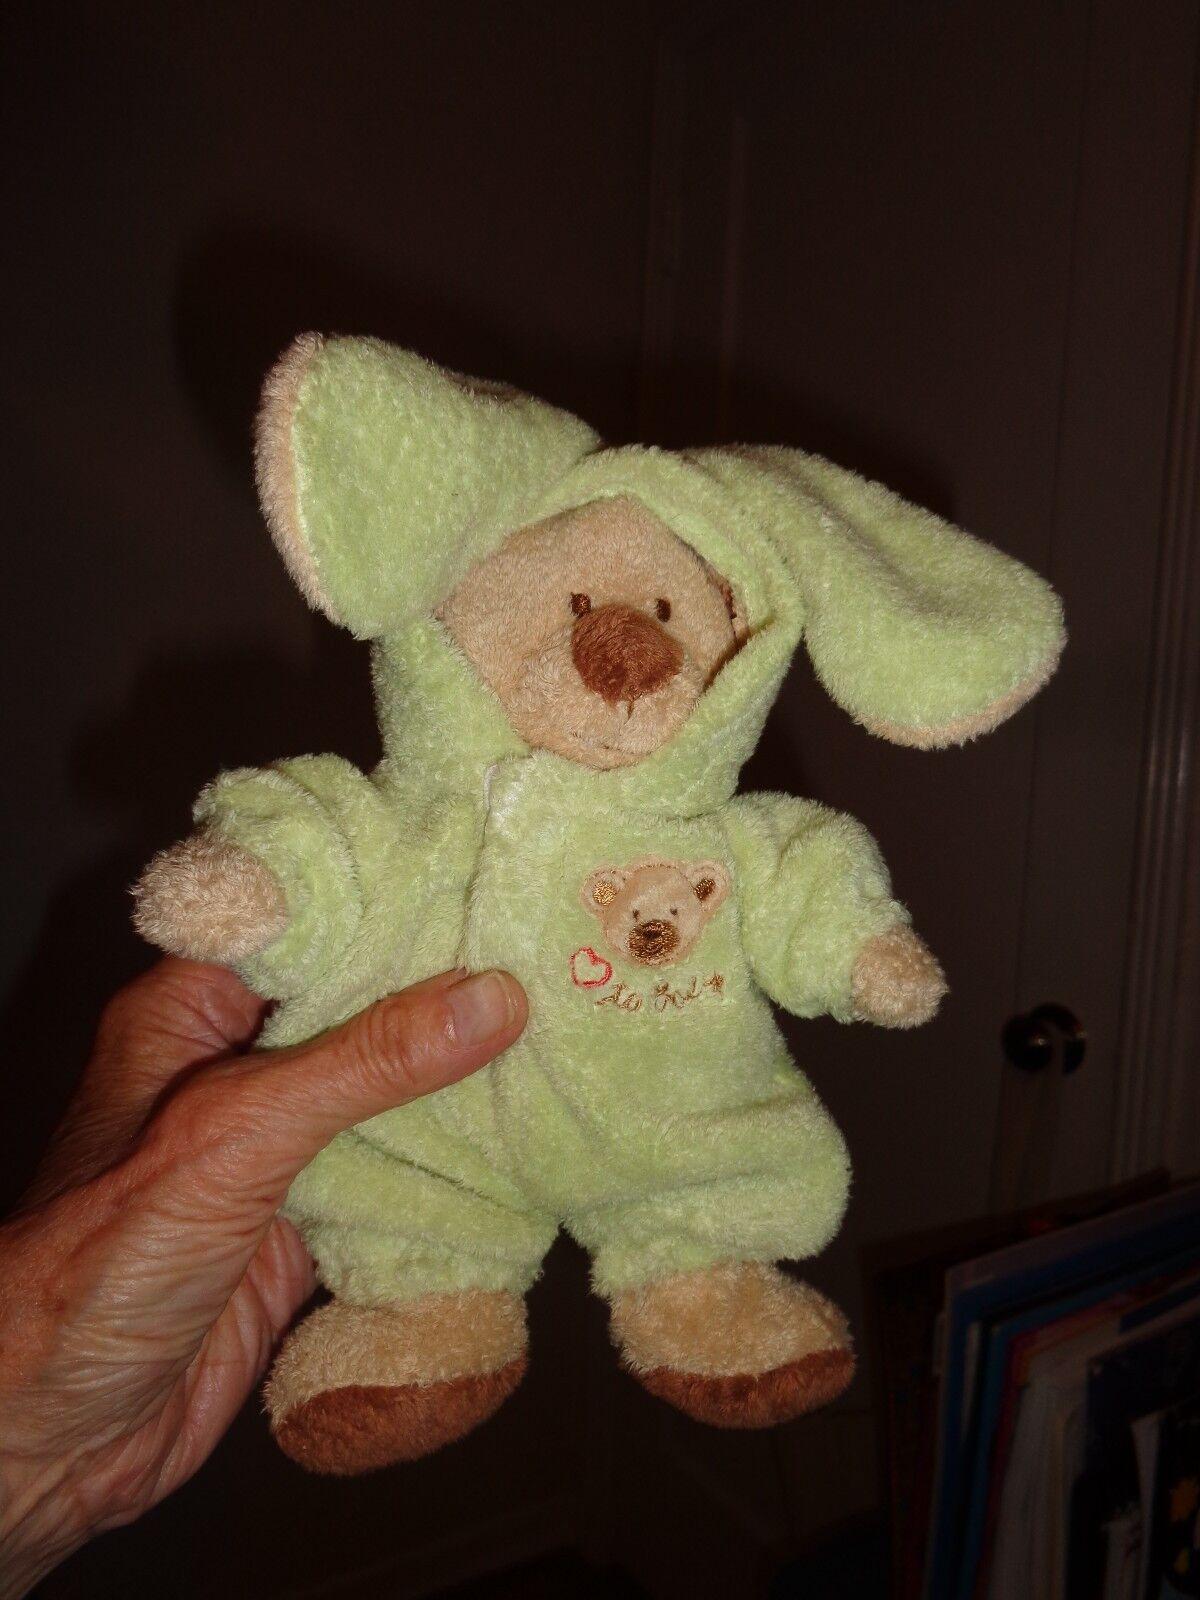 Ty PJ Bear Pluffies 8  Green Removable Pajamas Stuffed Animal Plush 2004 RARE